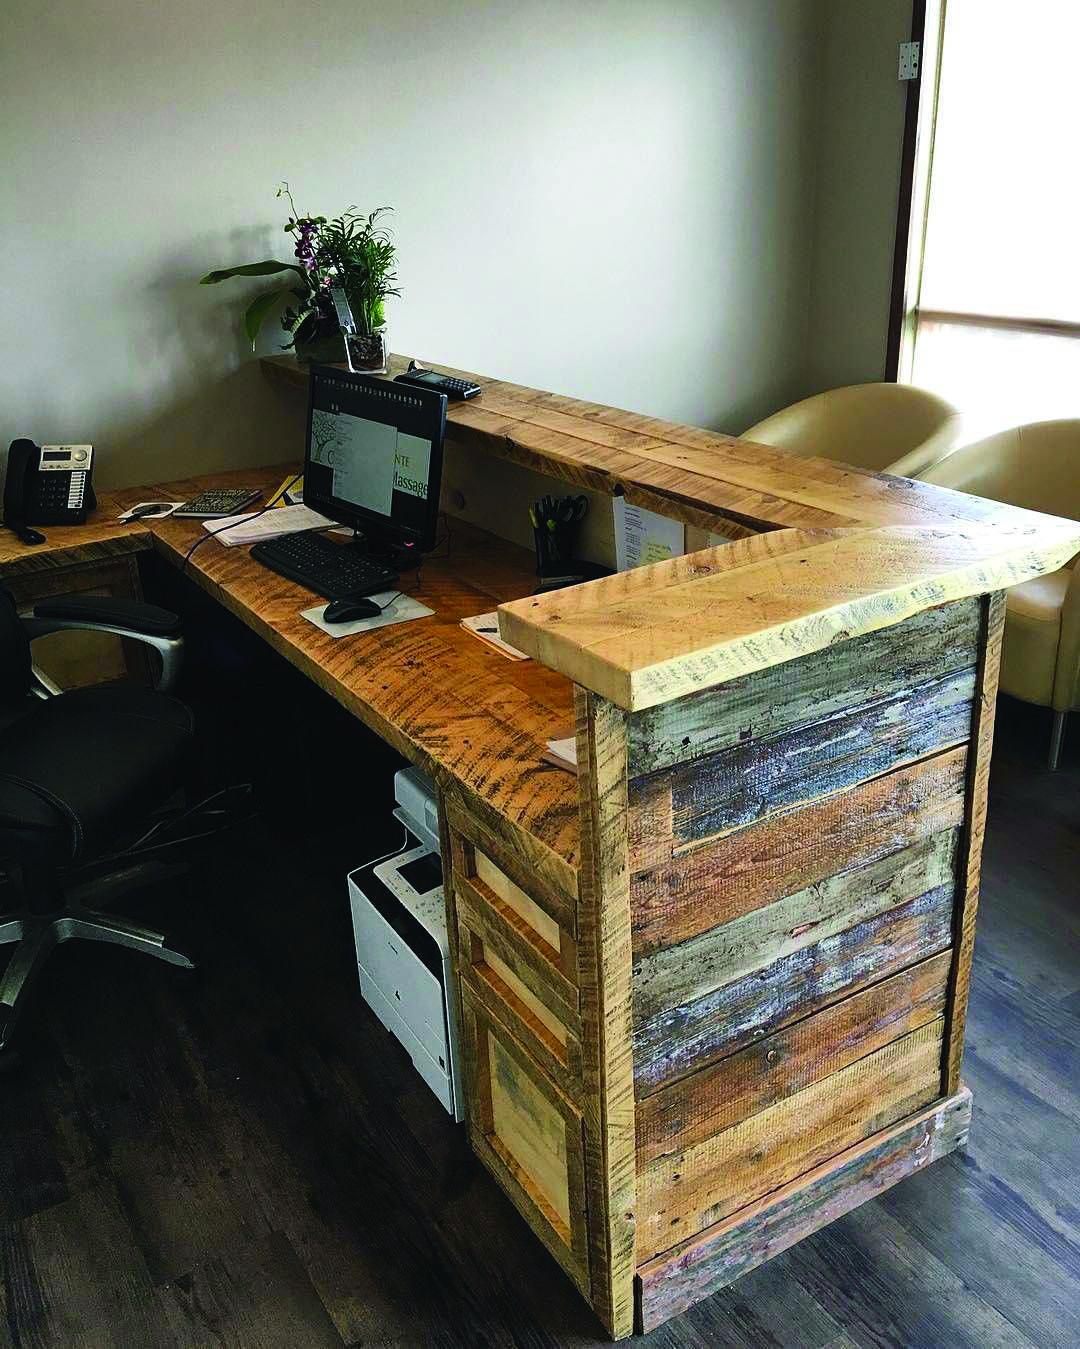 30 Celebration Desk Tips 2019 Trends Small Rustic Wood Modern